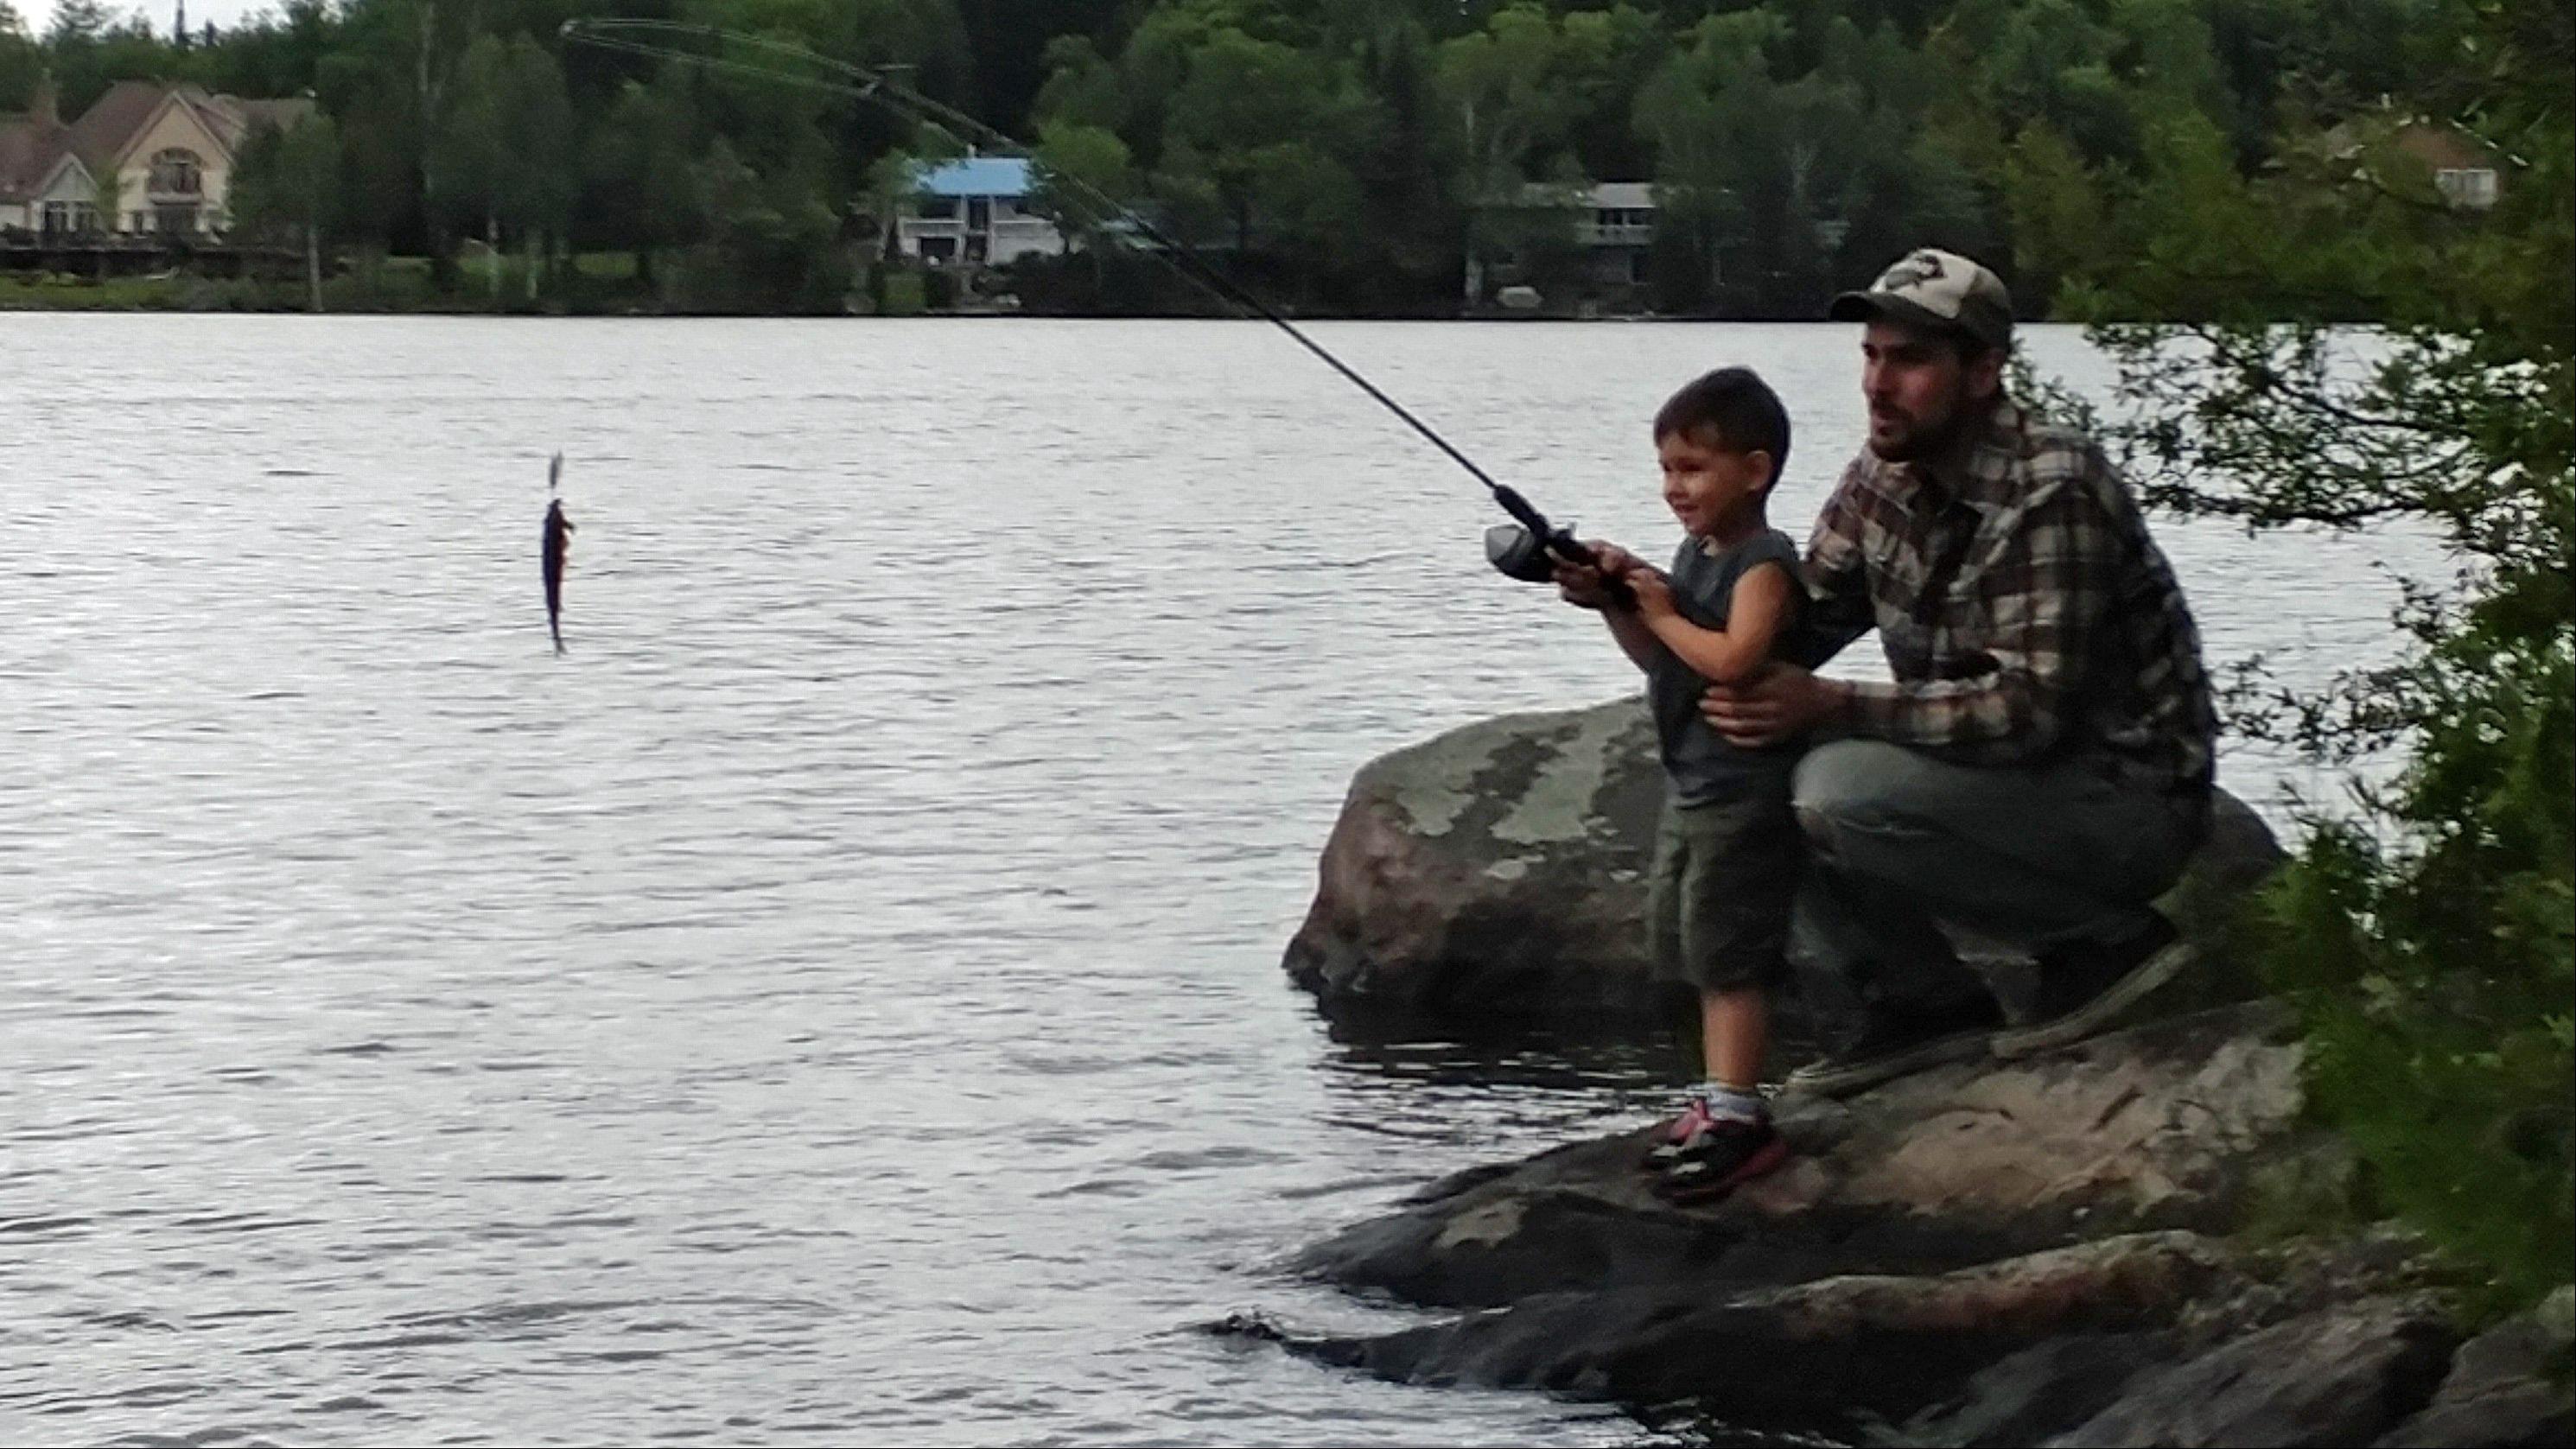 Tournoi de p che 2018 fishing tournement for Illinois fishing regulations 2017